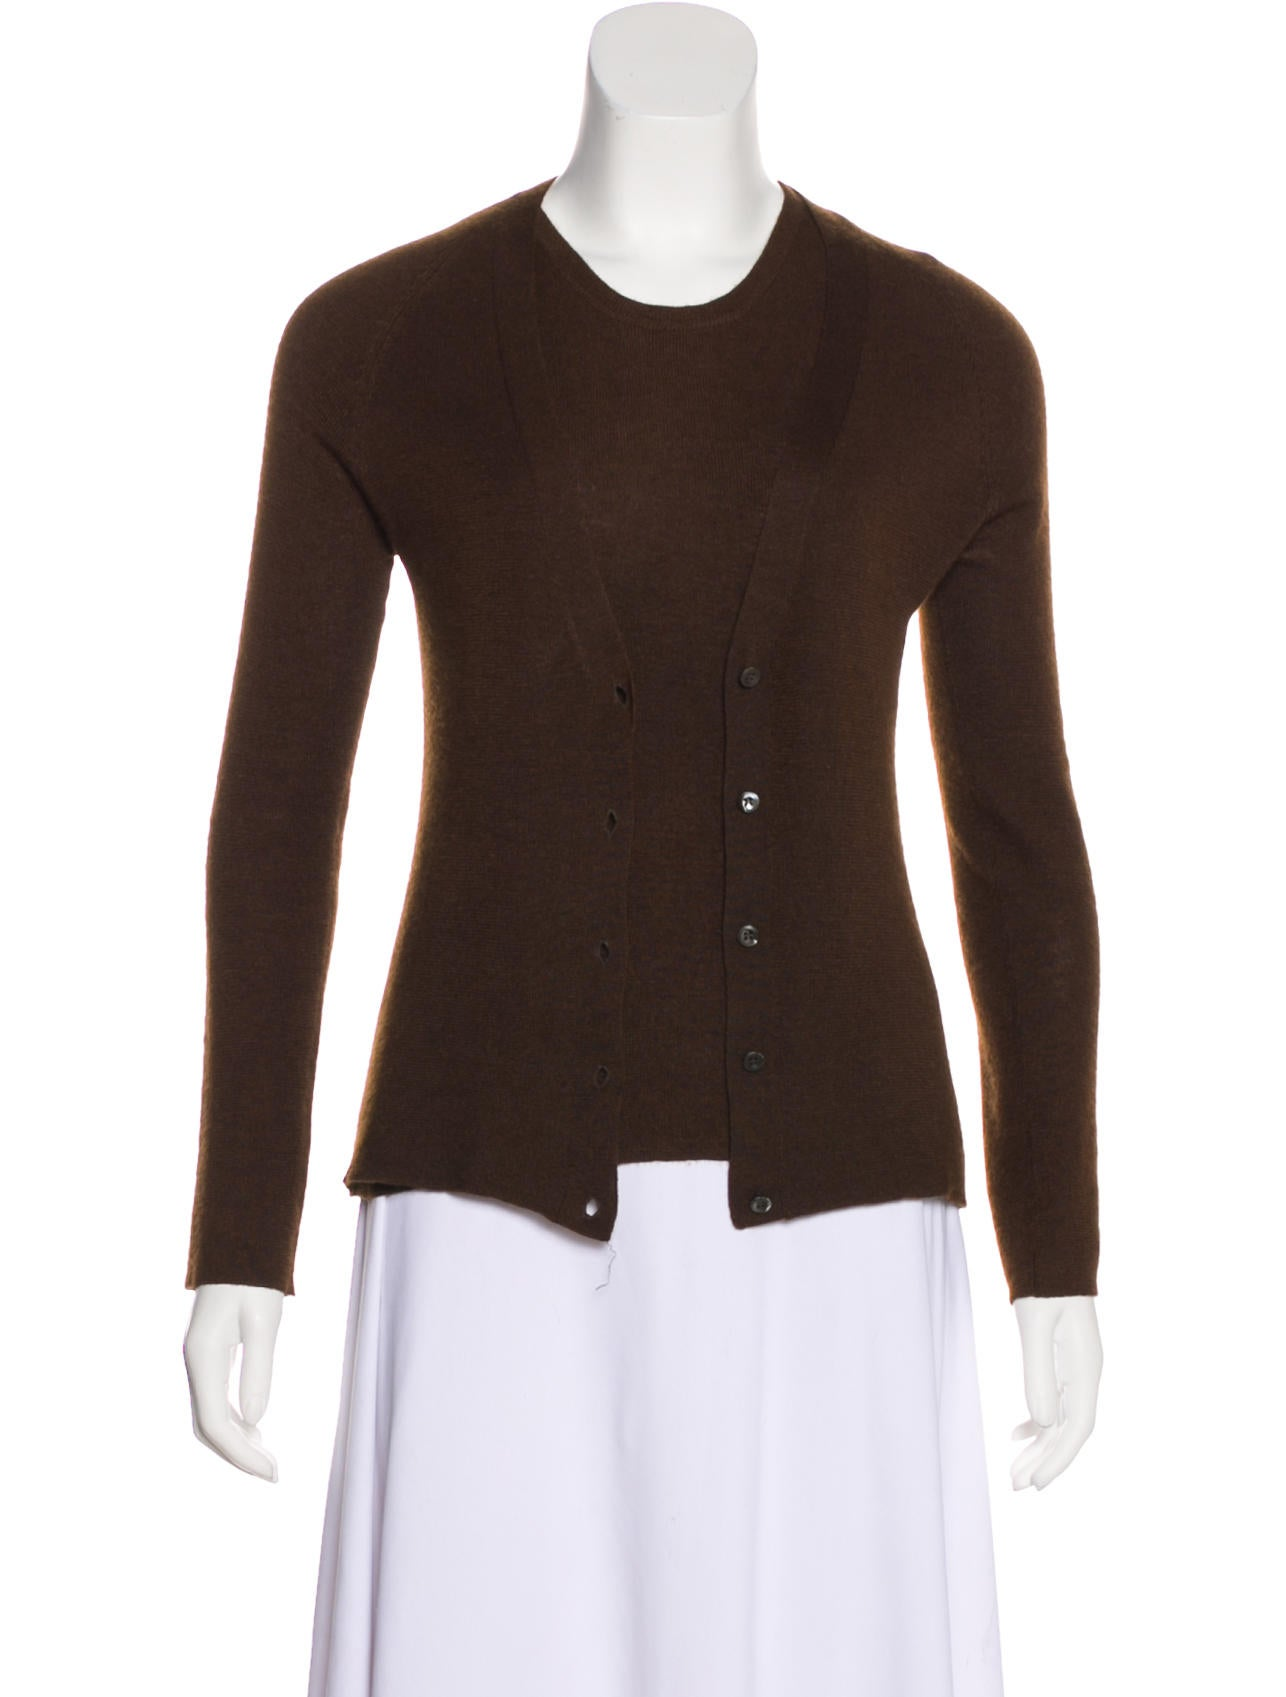 Prada Cashmere Blend Sweater Set Clothing Pra231350 The Realreal